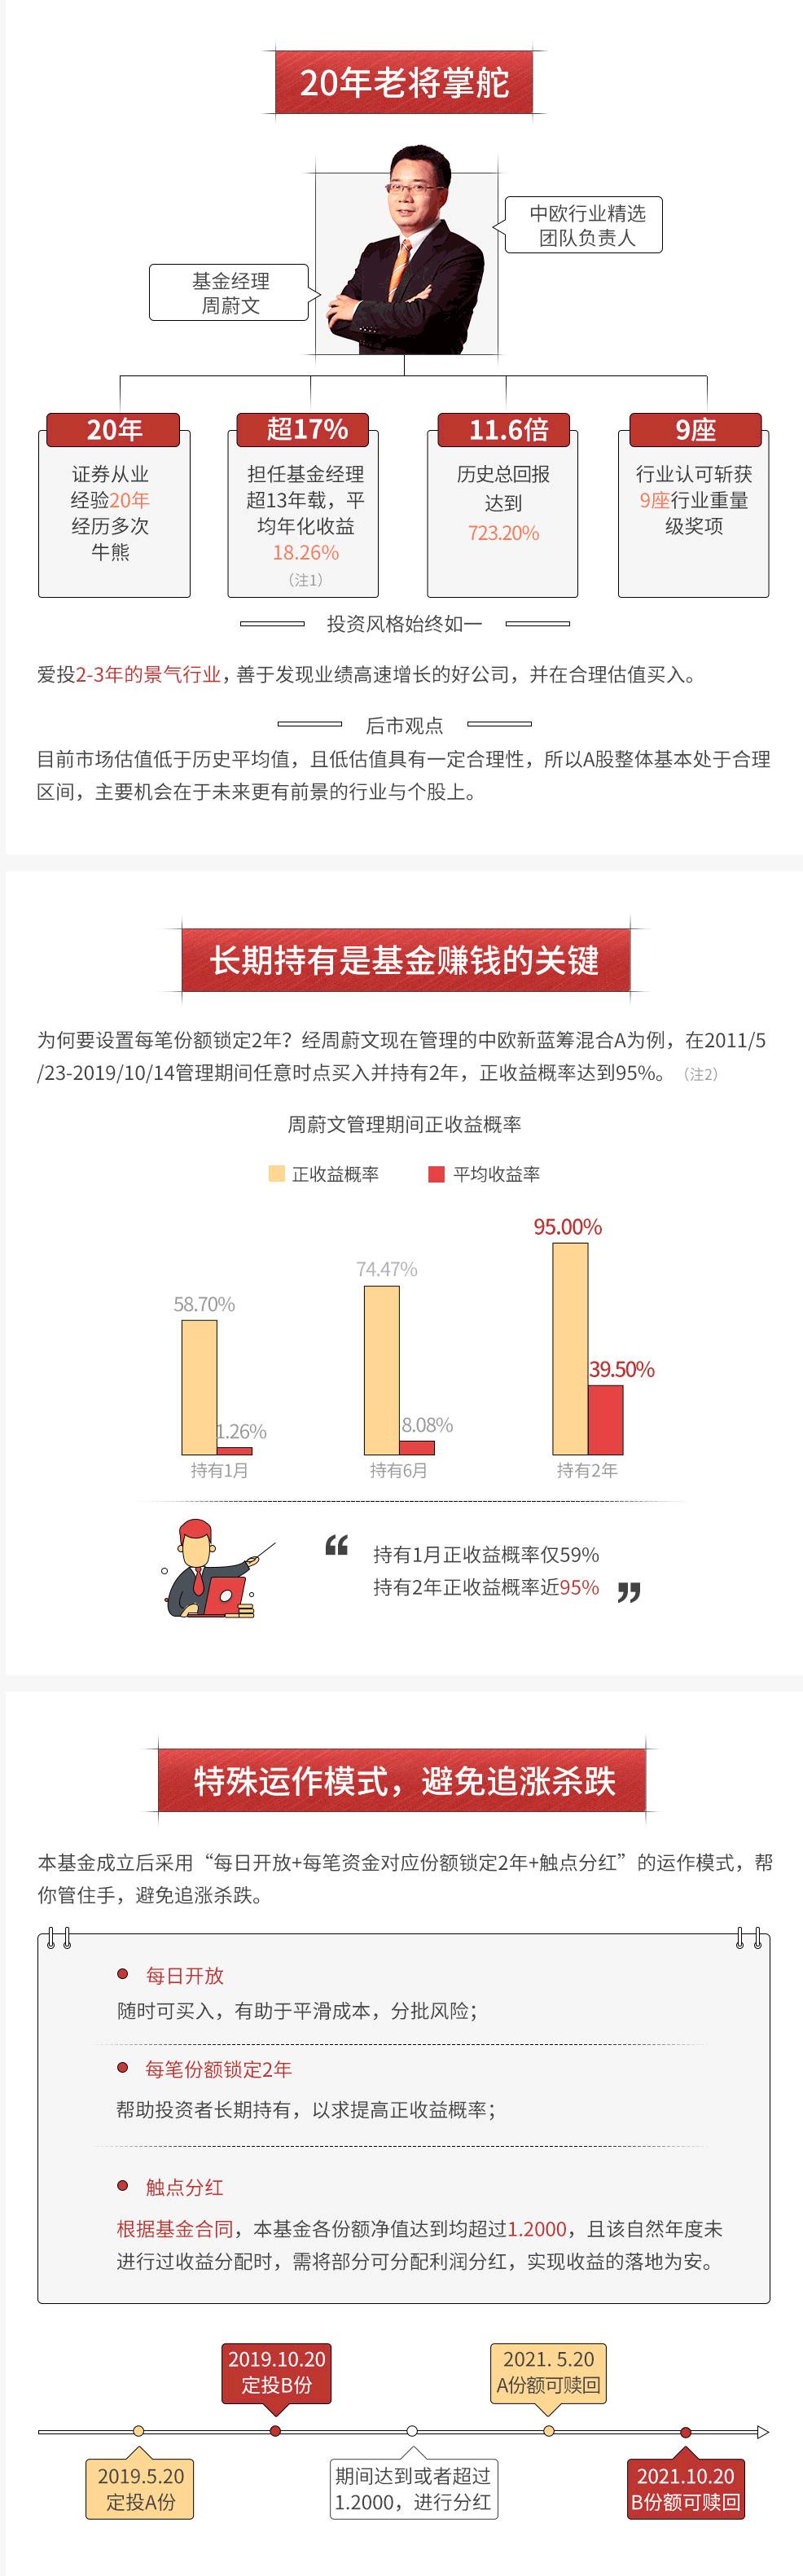 中欧匠心IPO专题-pc_05.png